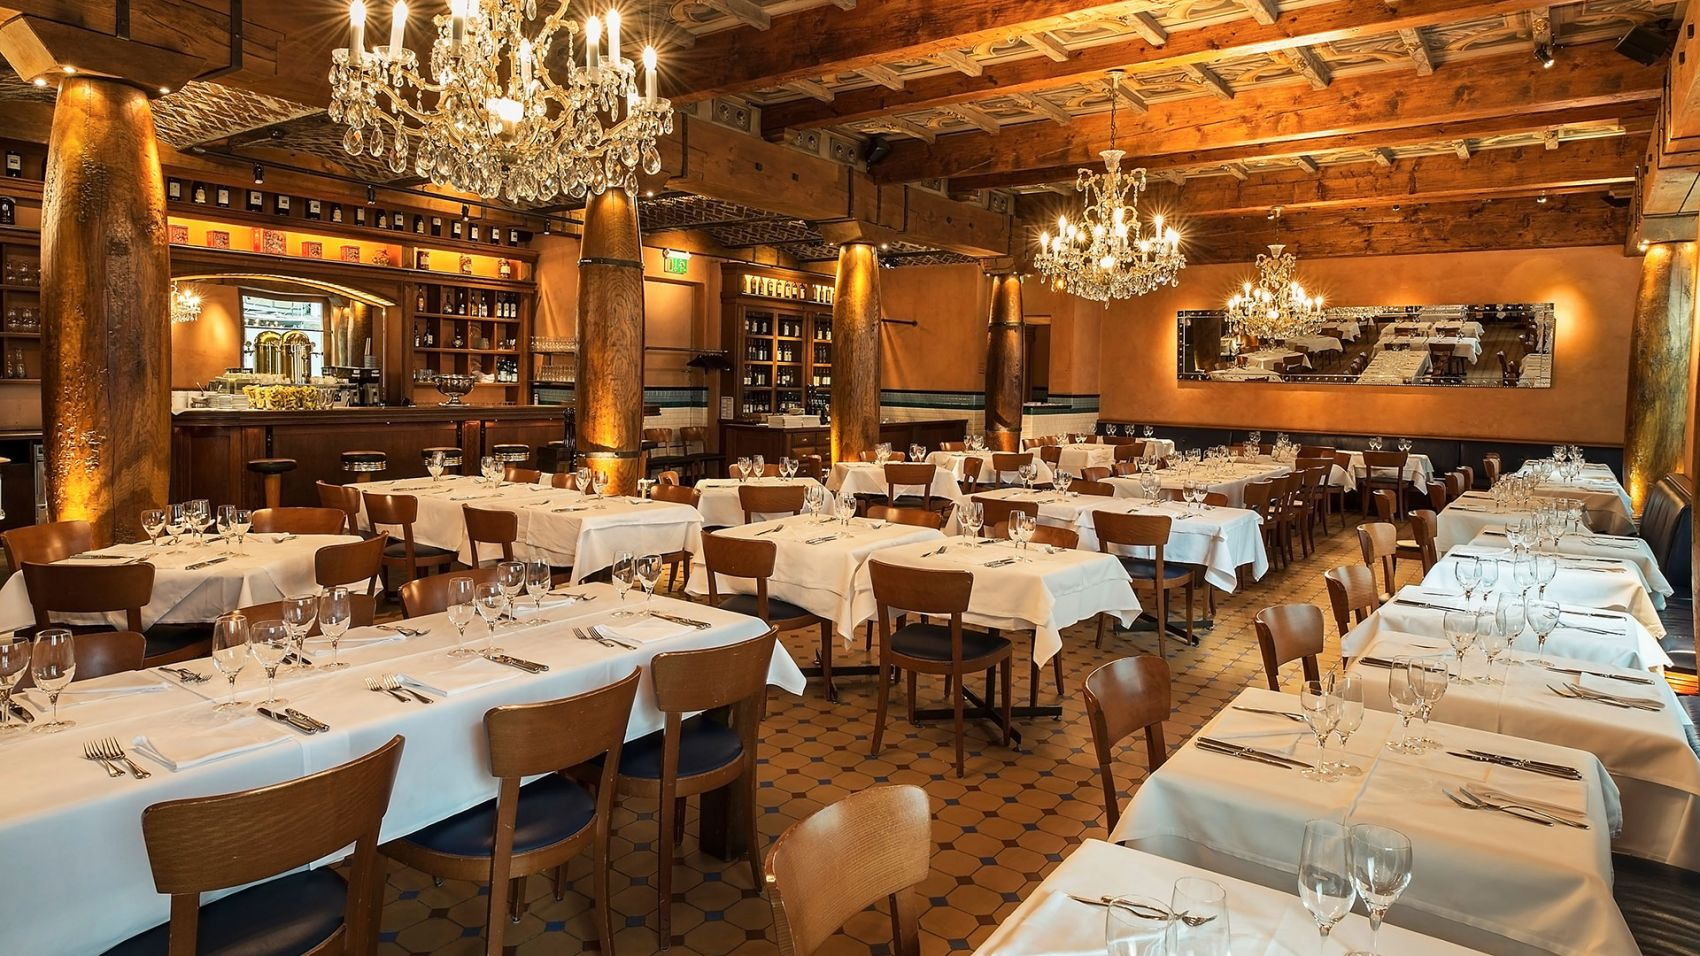 Restaurant la cucina lucerne - Chow chow restaurante ...